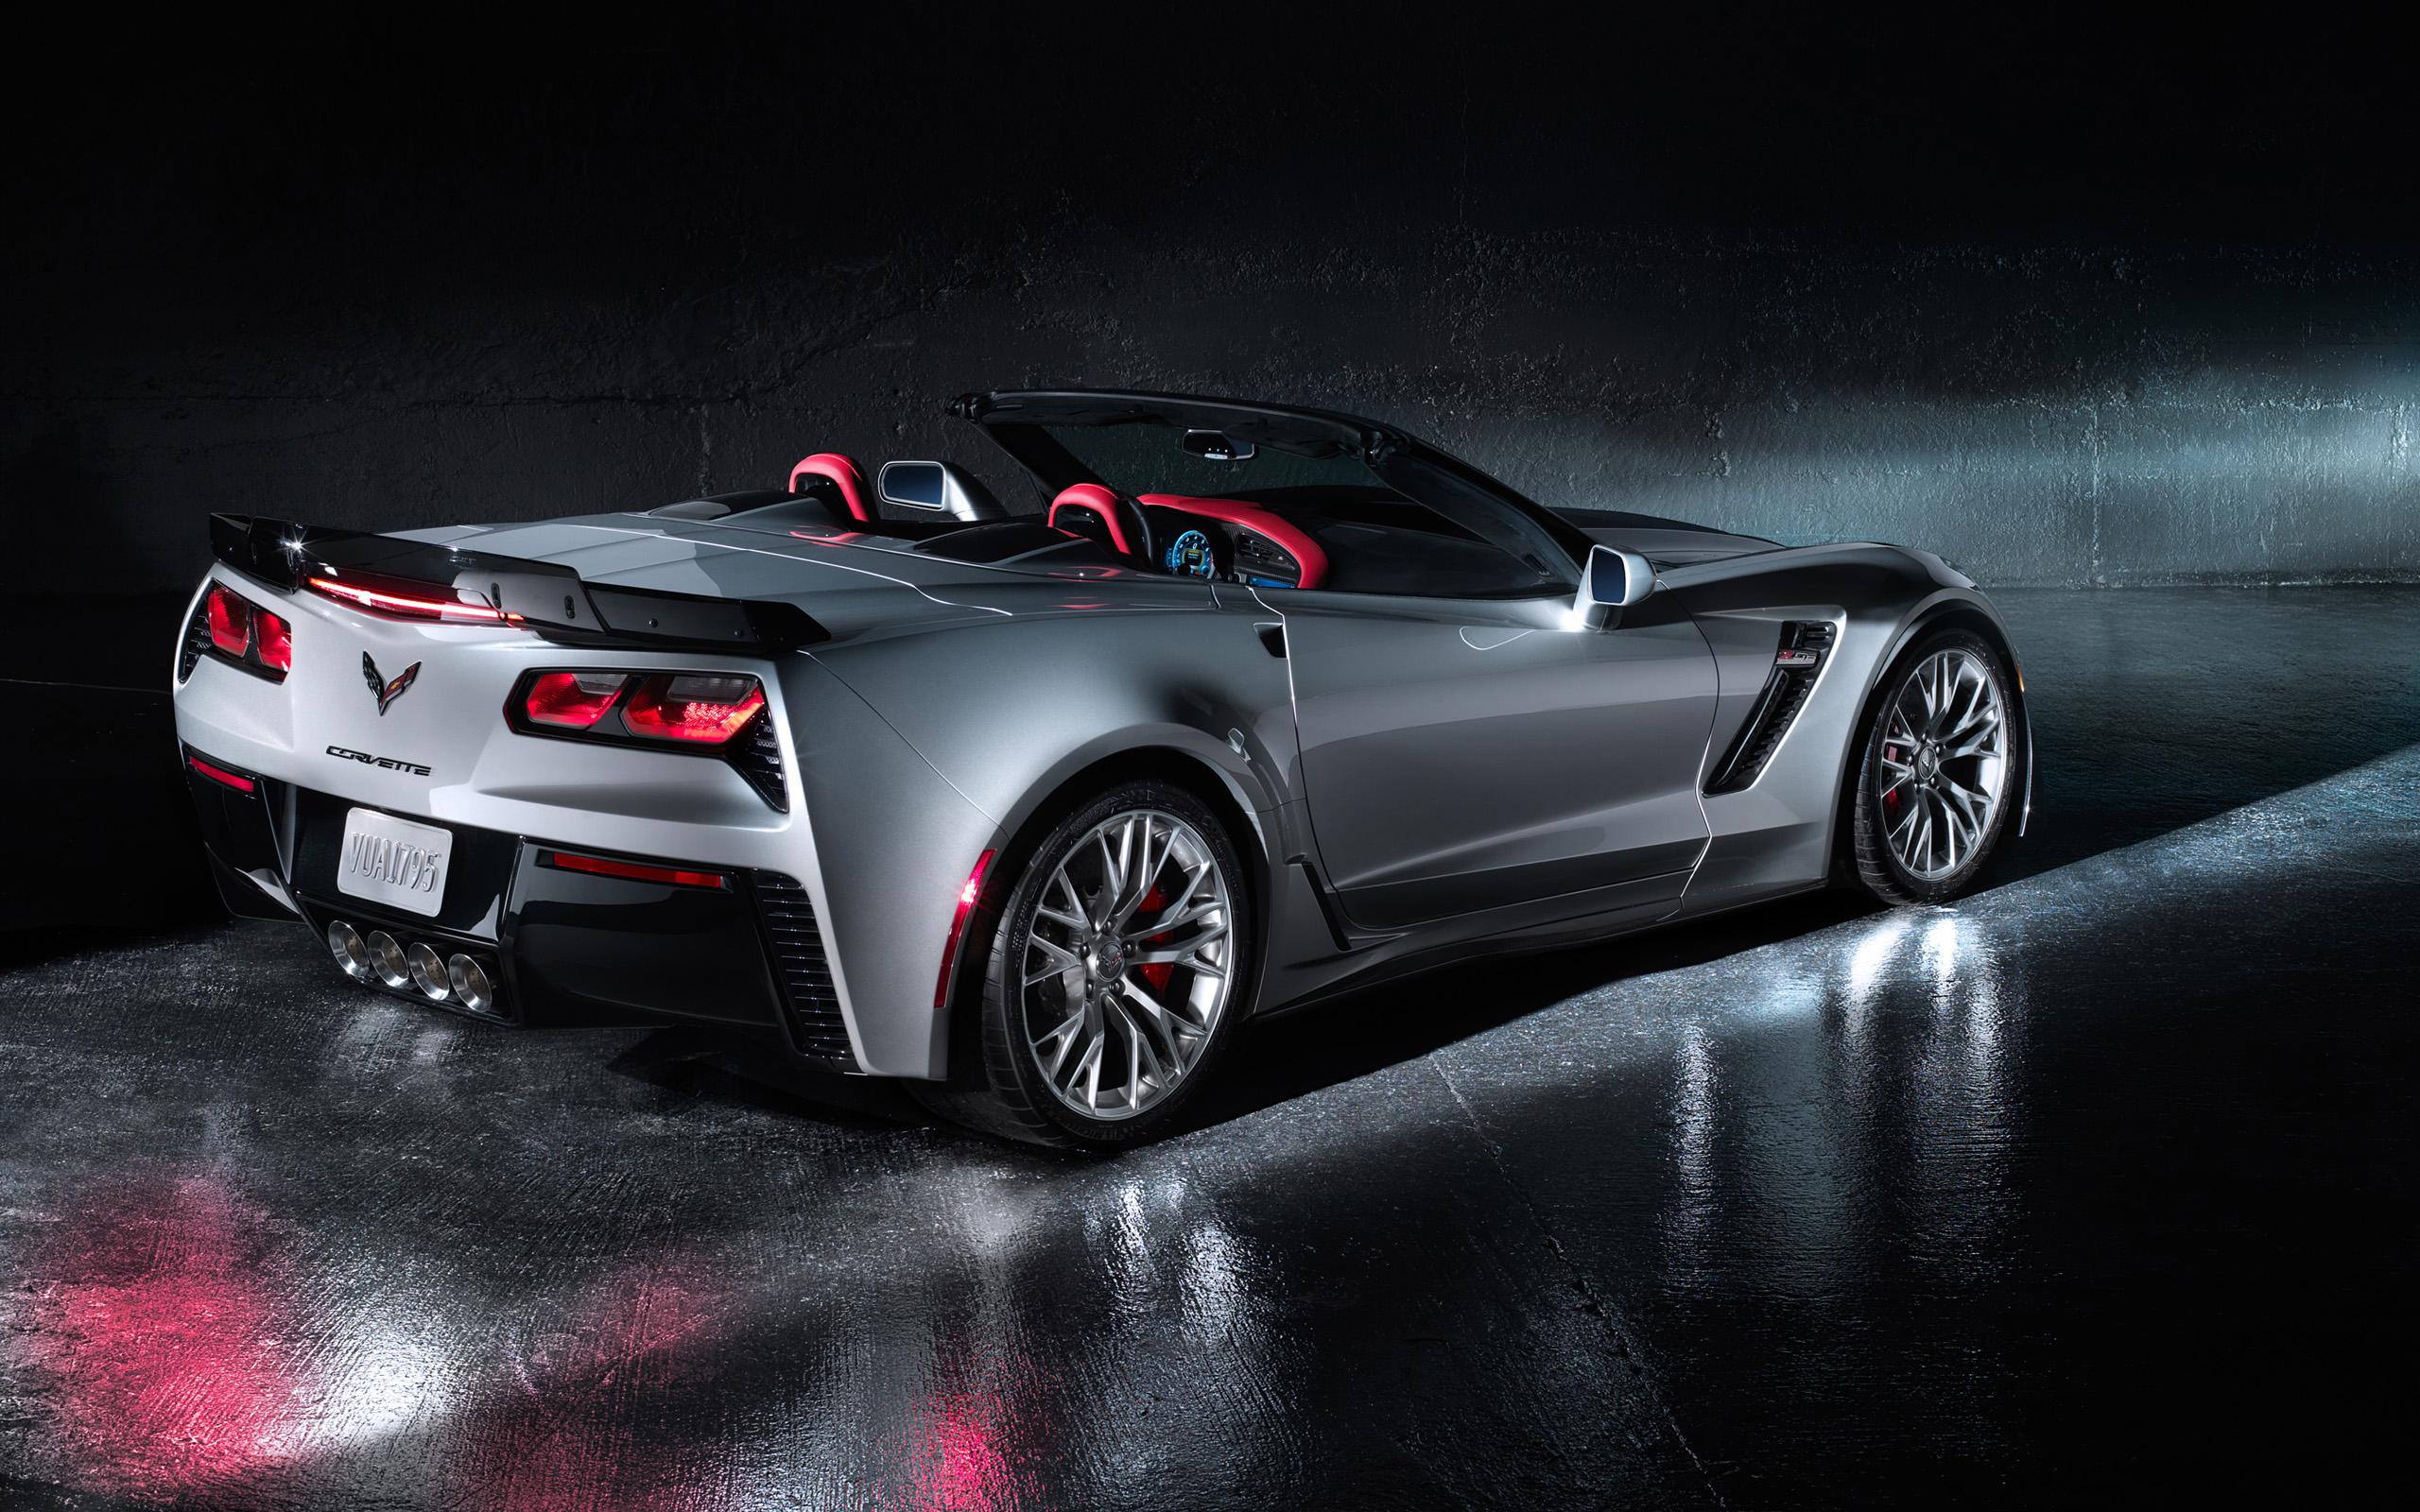 2015 chevrolet corvette z06 convertible 4 wallpaper hd car wallpapers id 4625. Black Bedroom Furniture Sets. Home Design Ideas